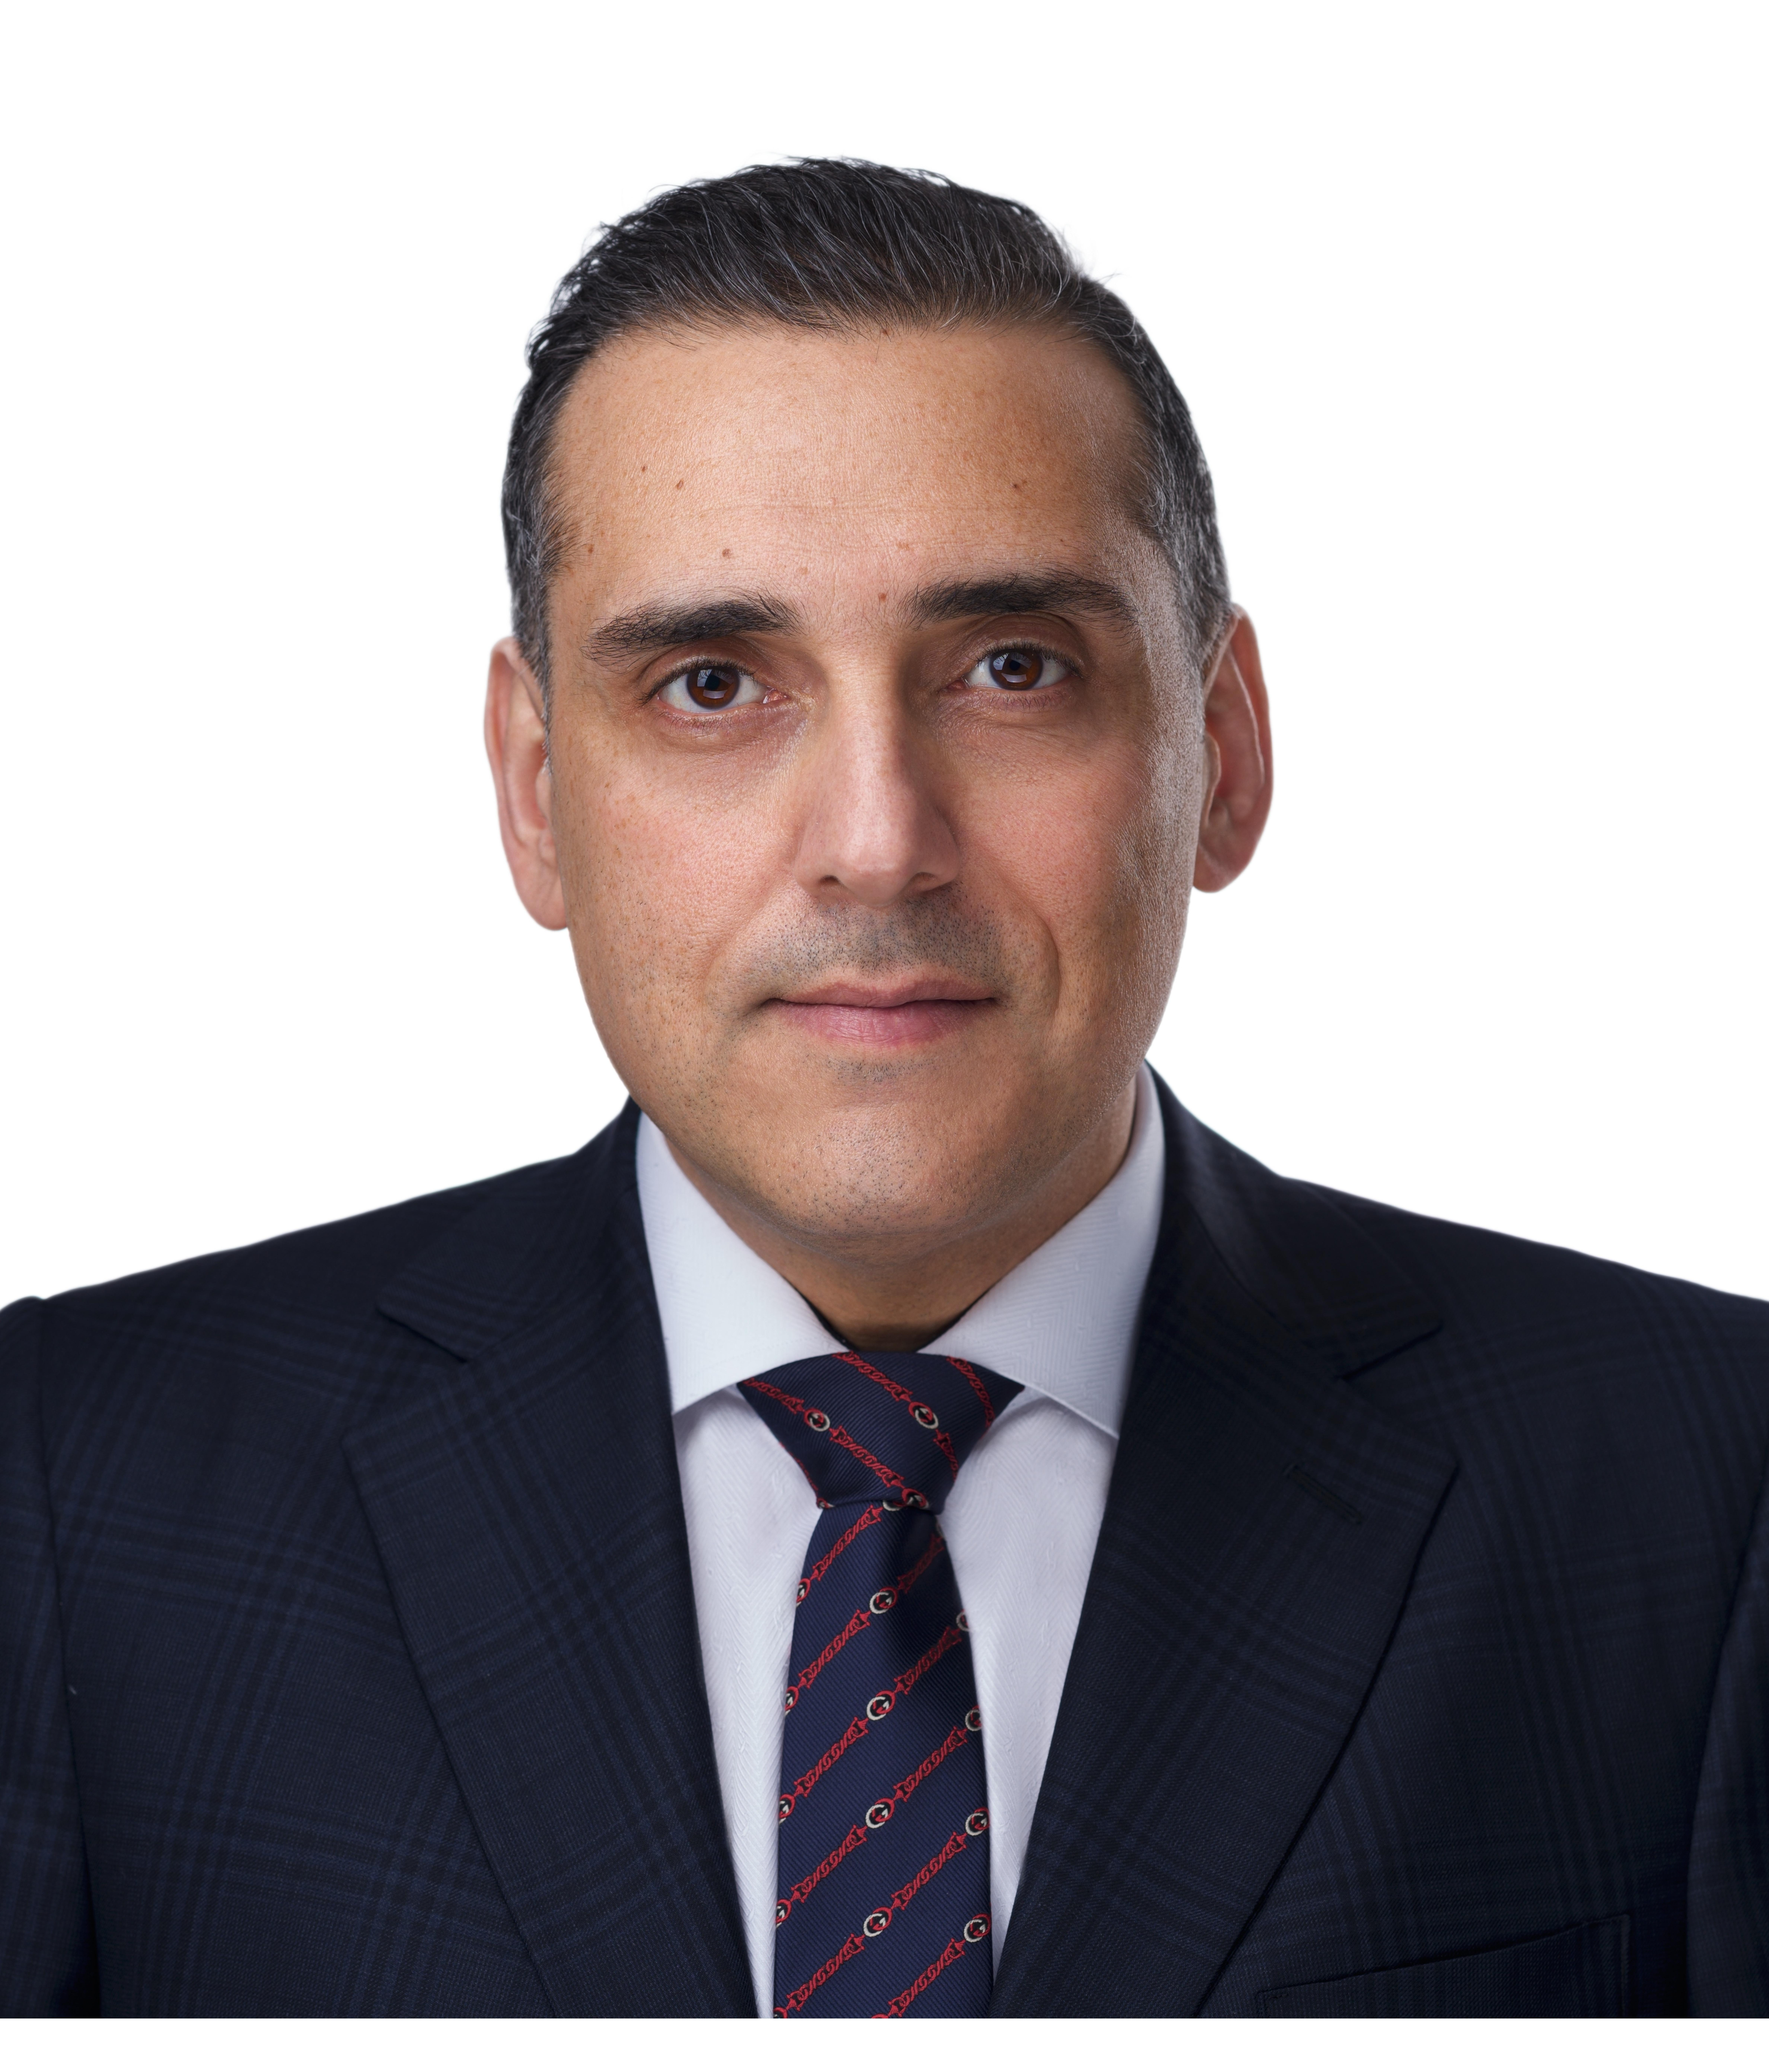 Carmine Padula